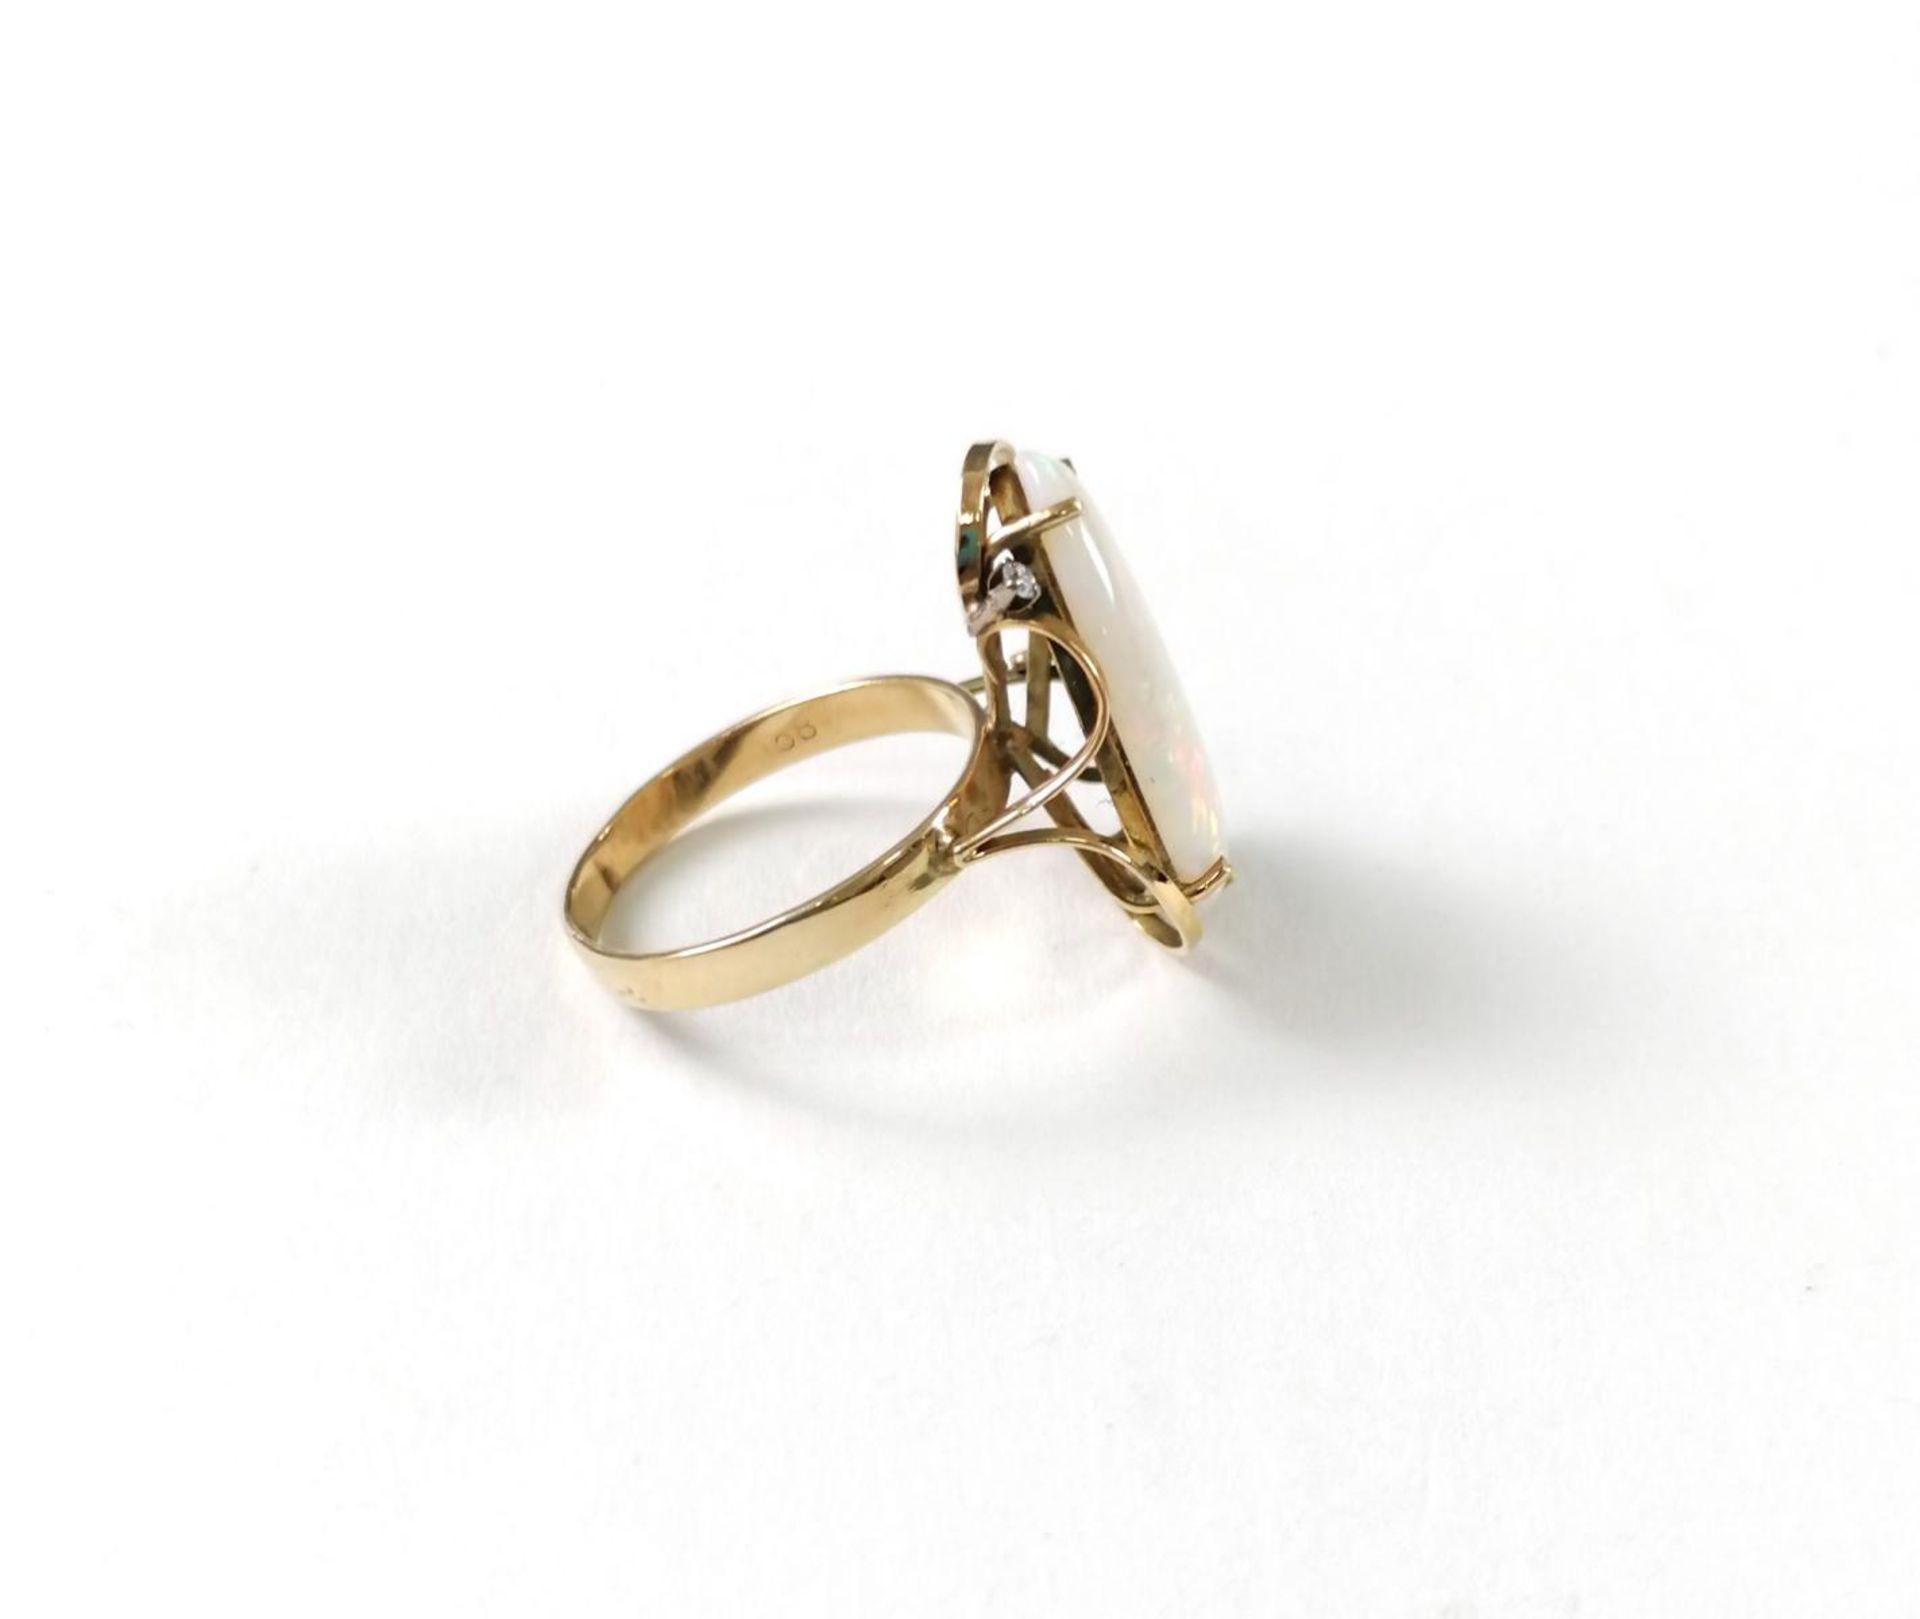 Gelbgold-Opalring mit Diamanten - Image 3 of 5